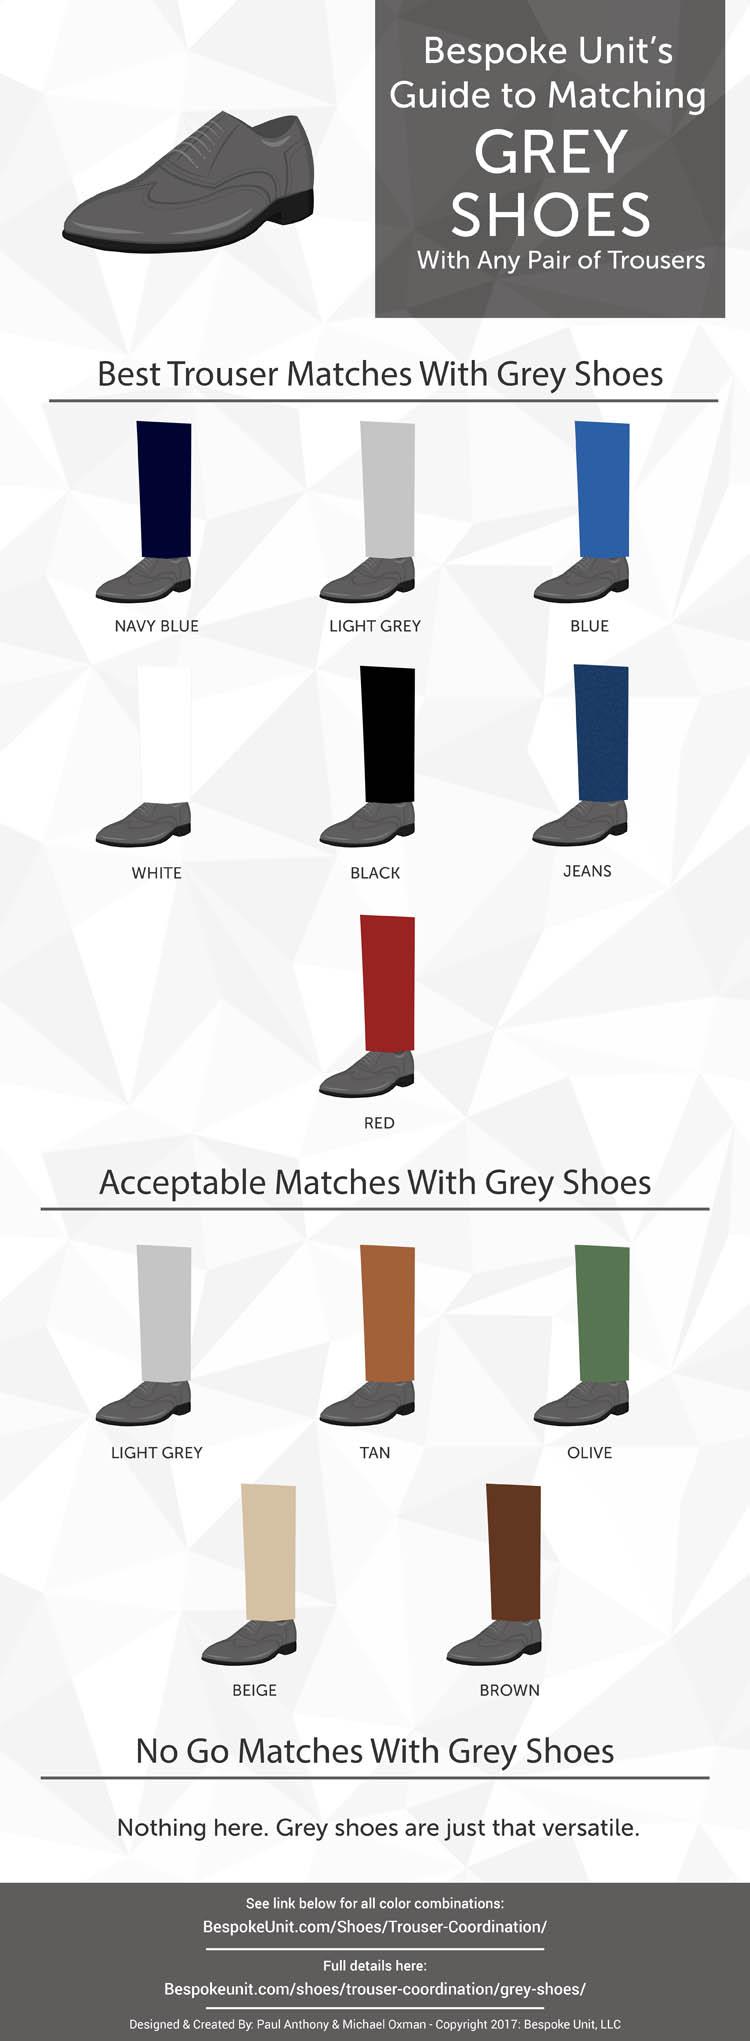 Grey-Shoe-Coordination-Graphic